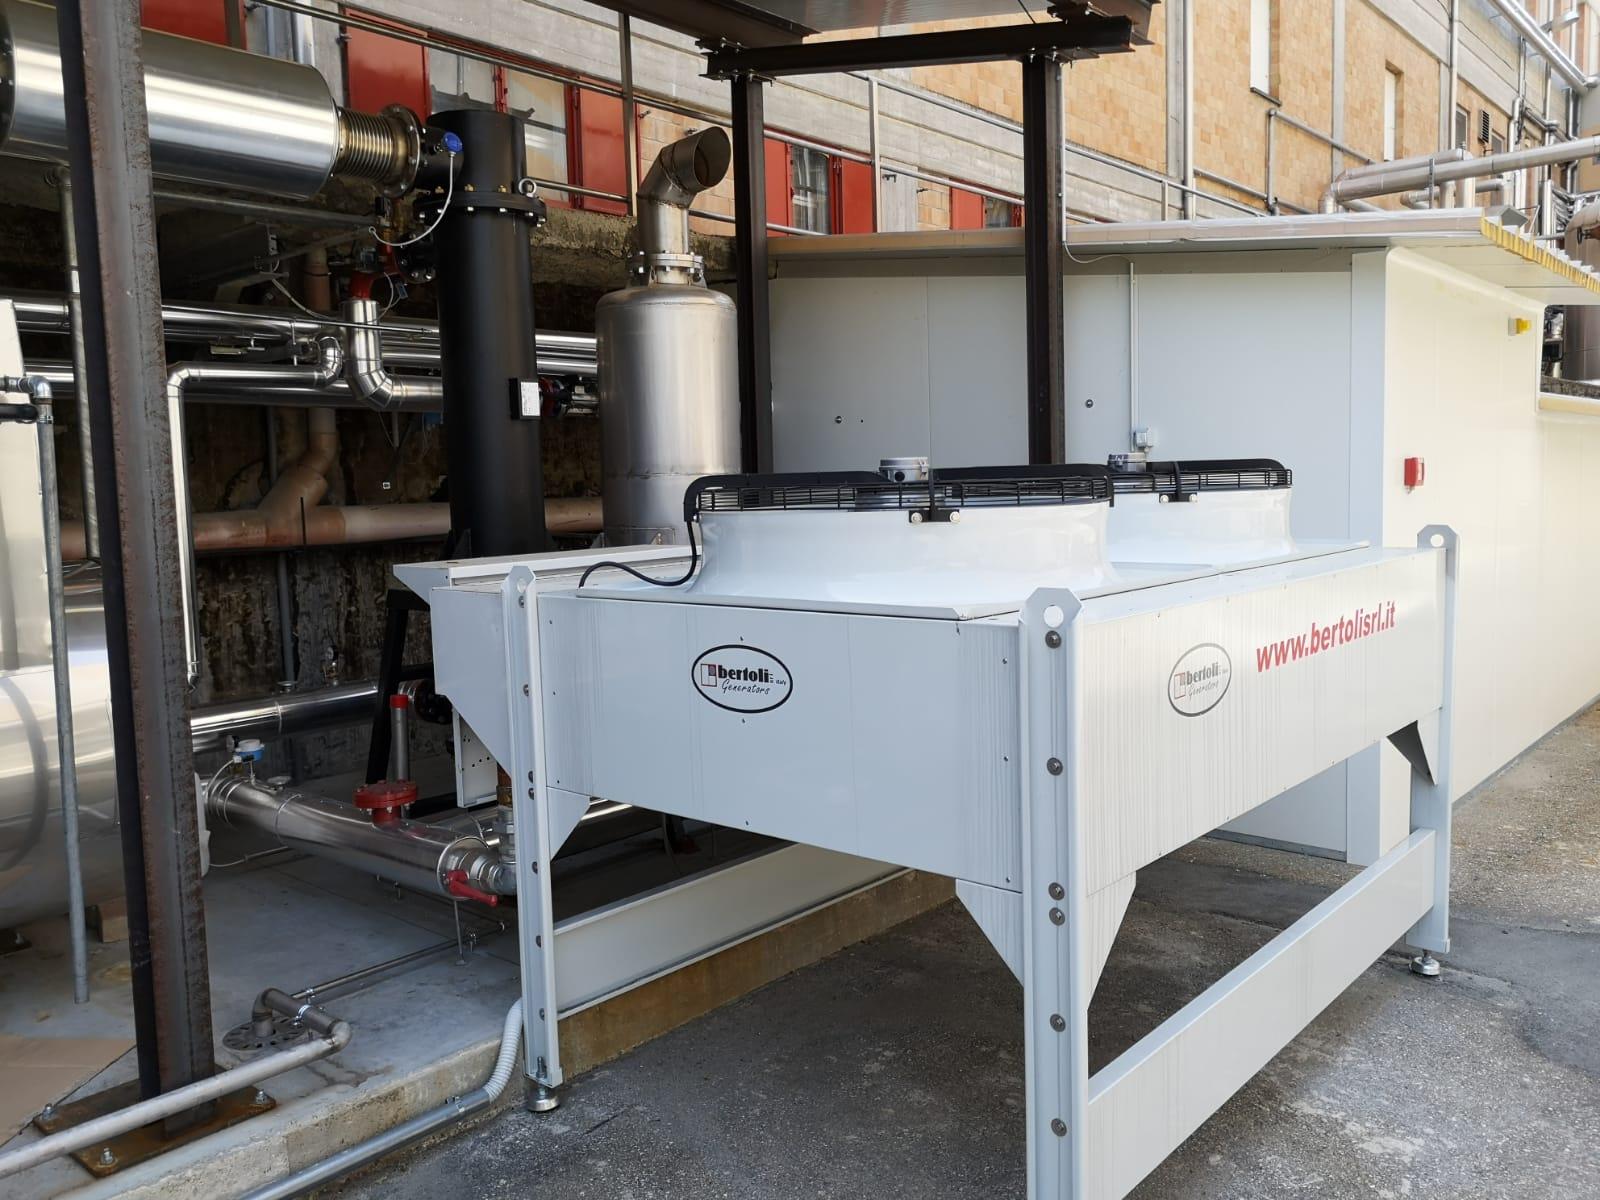 co-generator installation